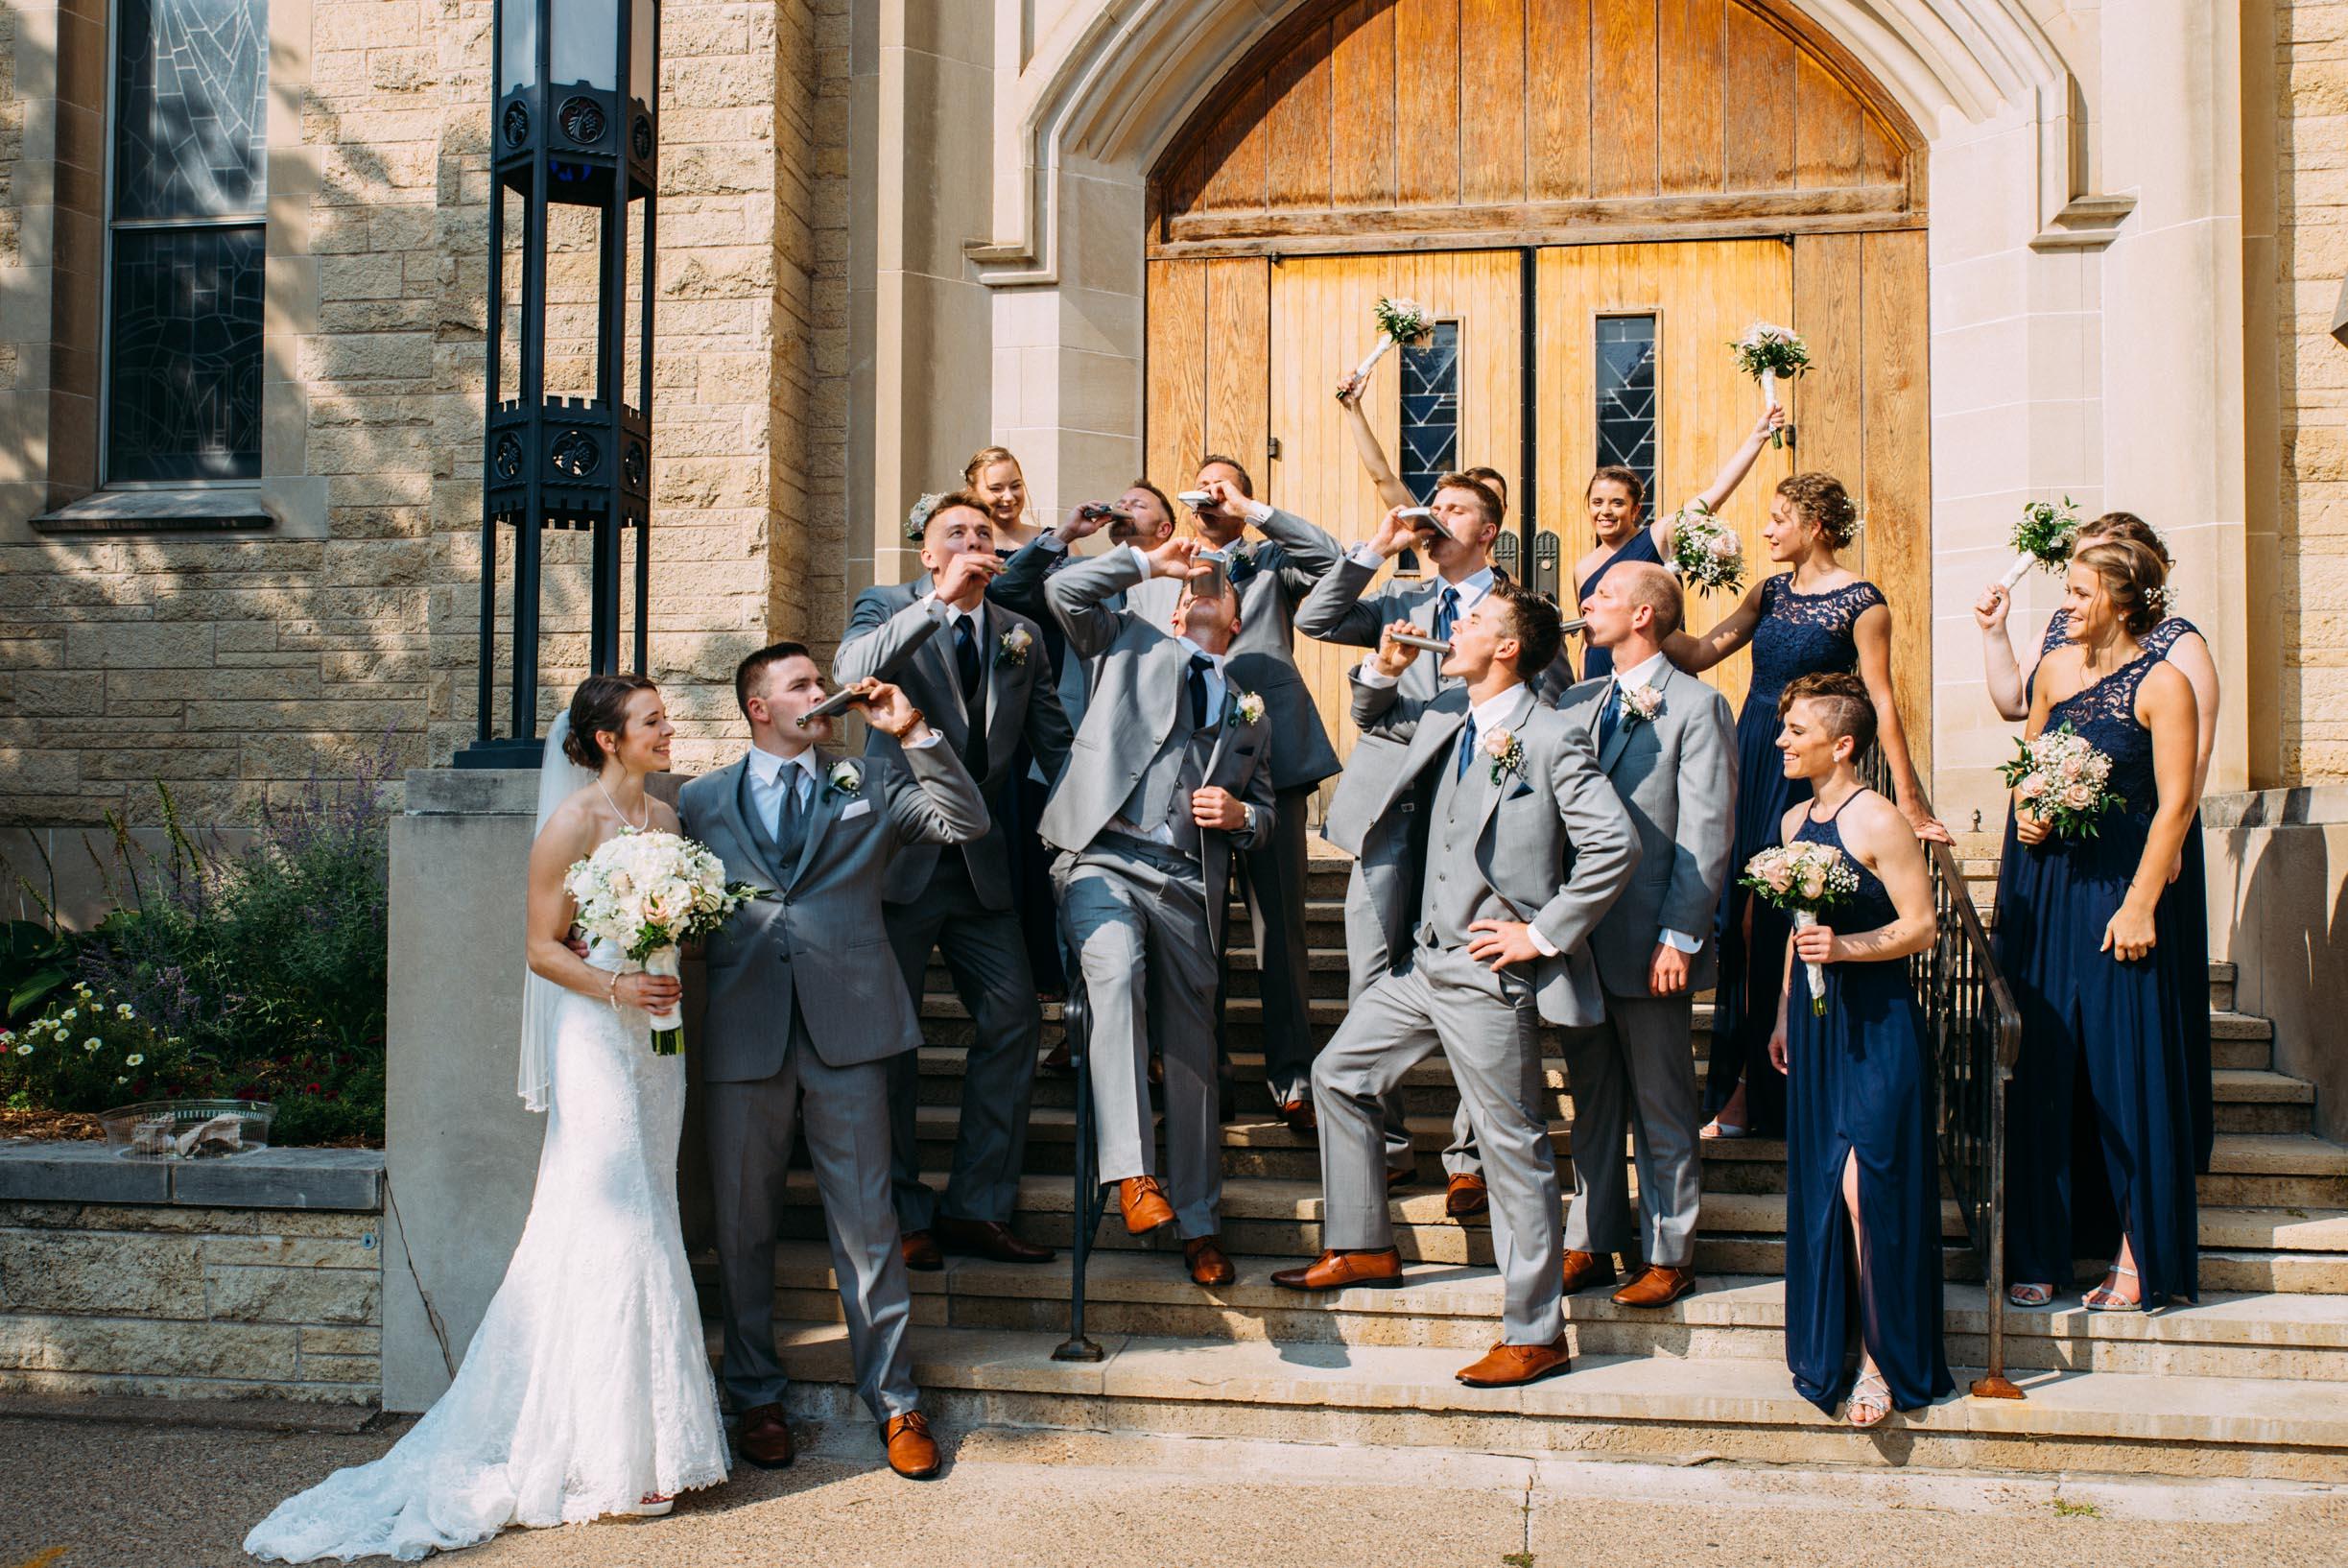 18-Lindsey Jake Wedding Party Winona St Martin's Lutheran Church.jpg